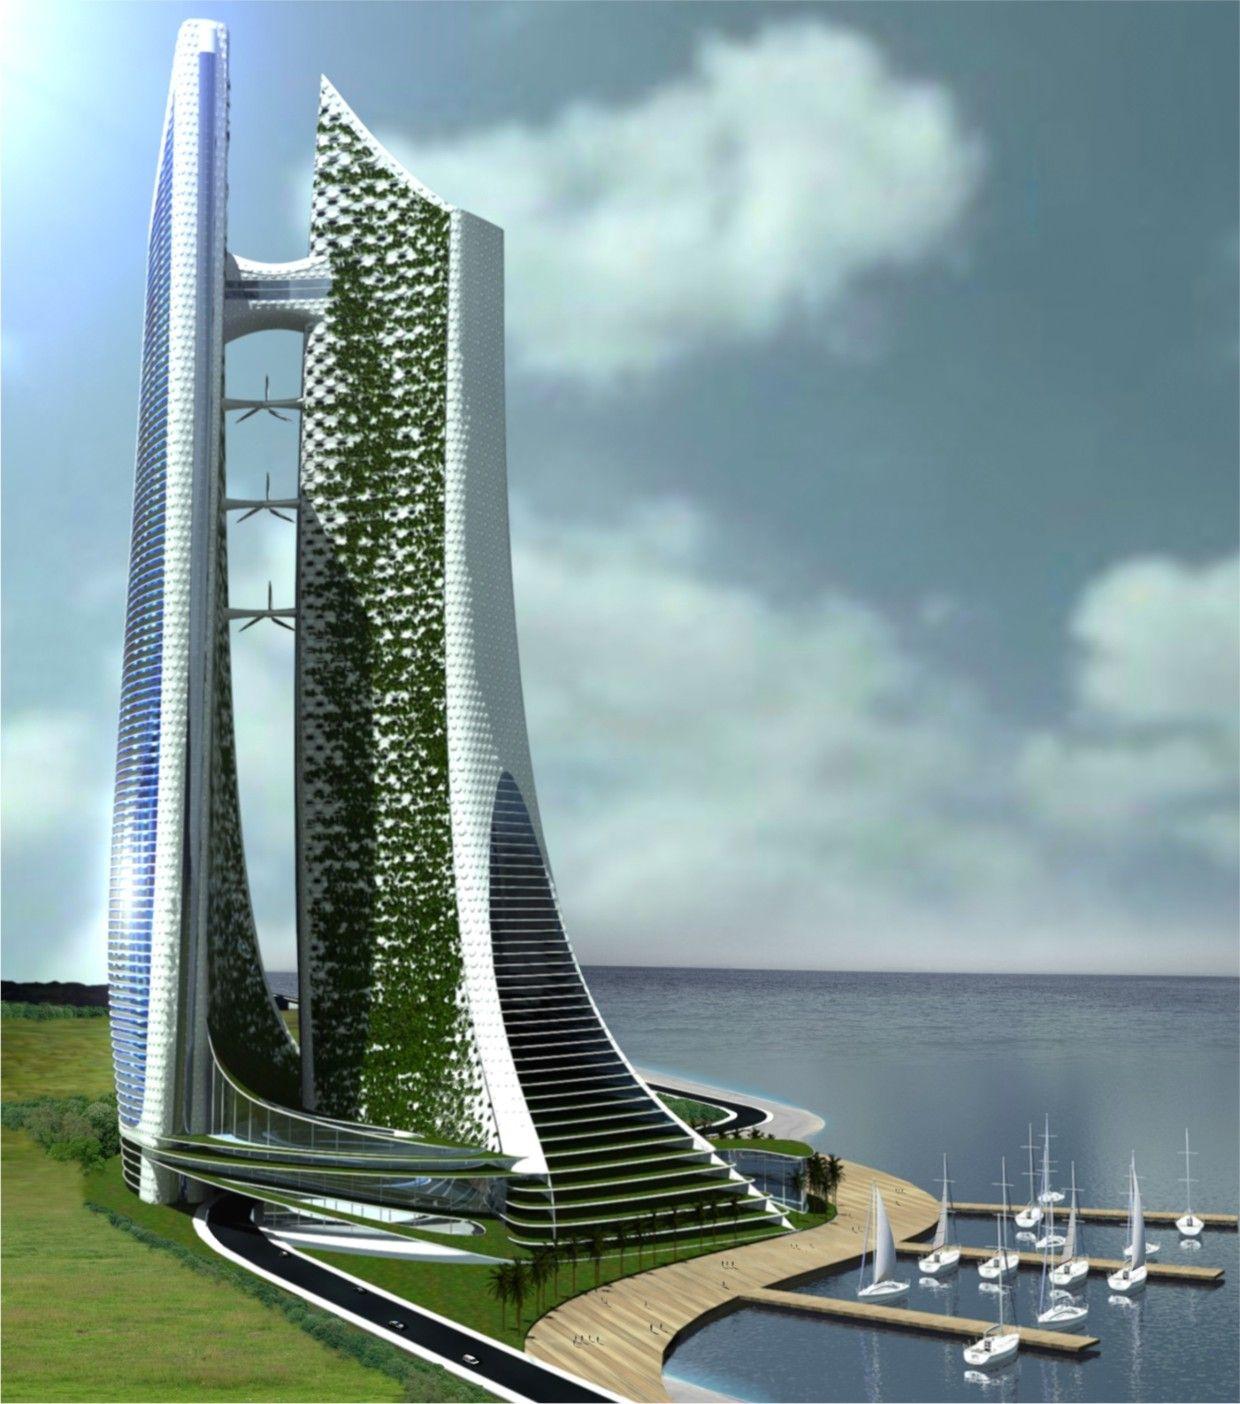 Arquitetura e urbanismo sustent vel eco cybernetic cidade for Ardeco uae